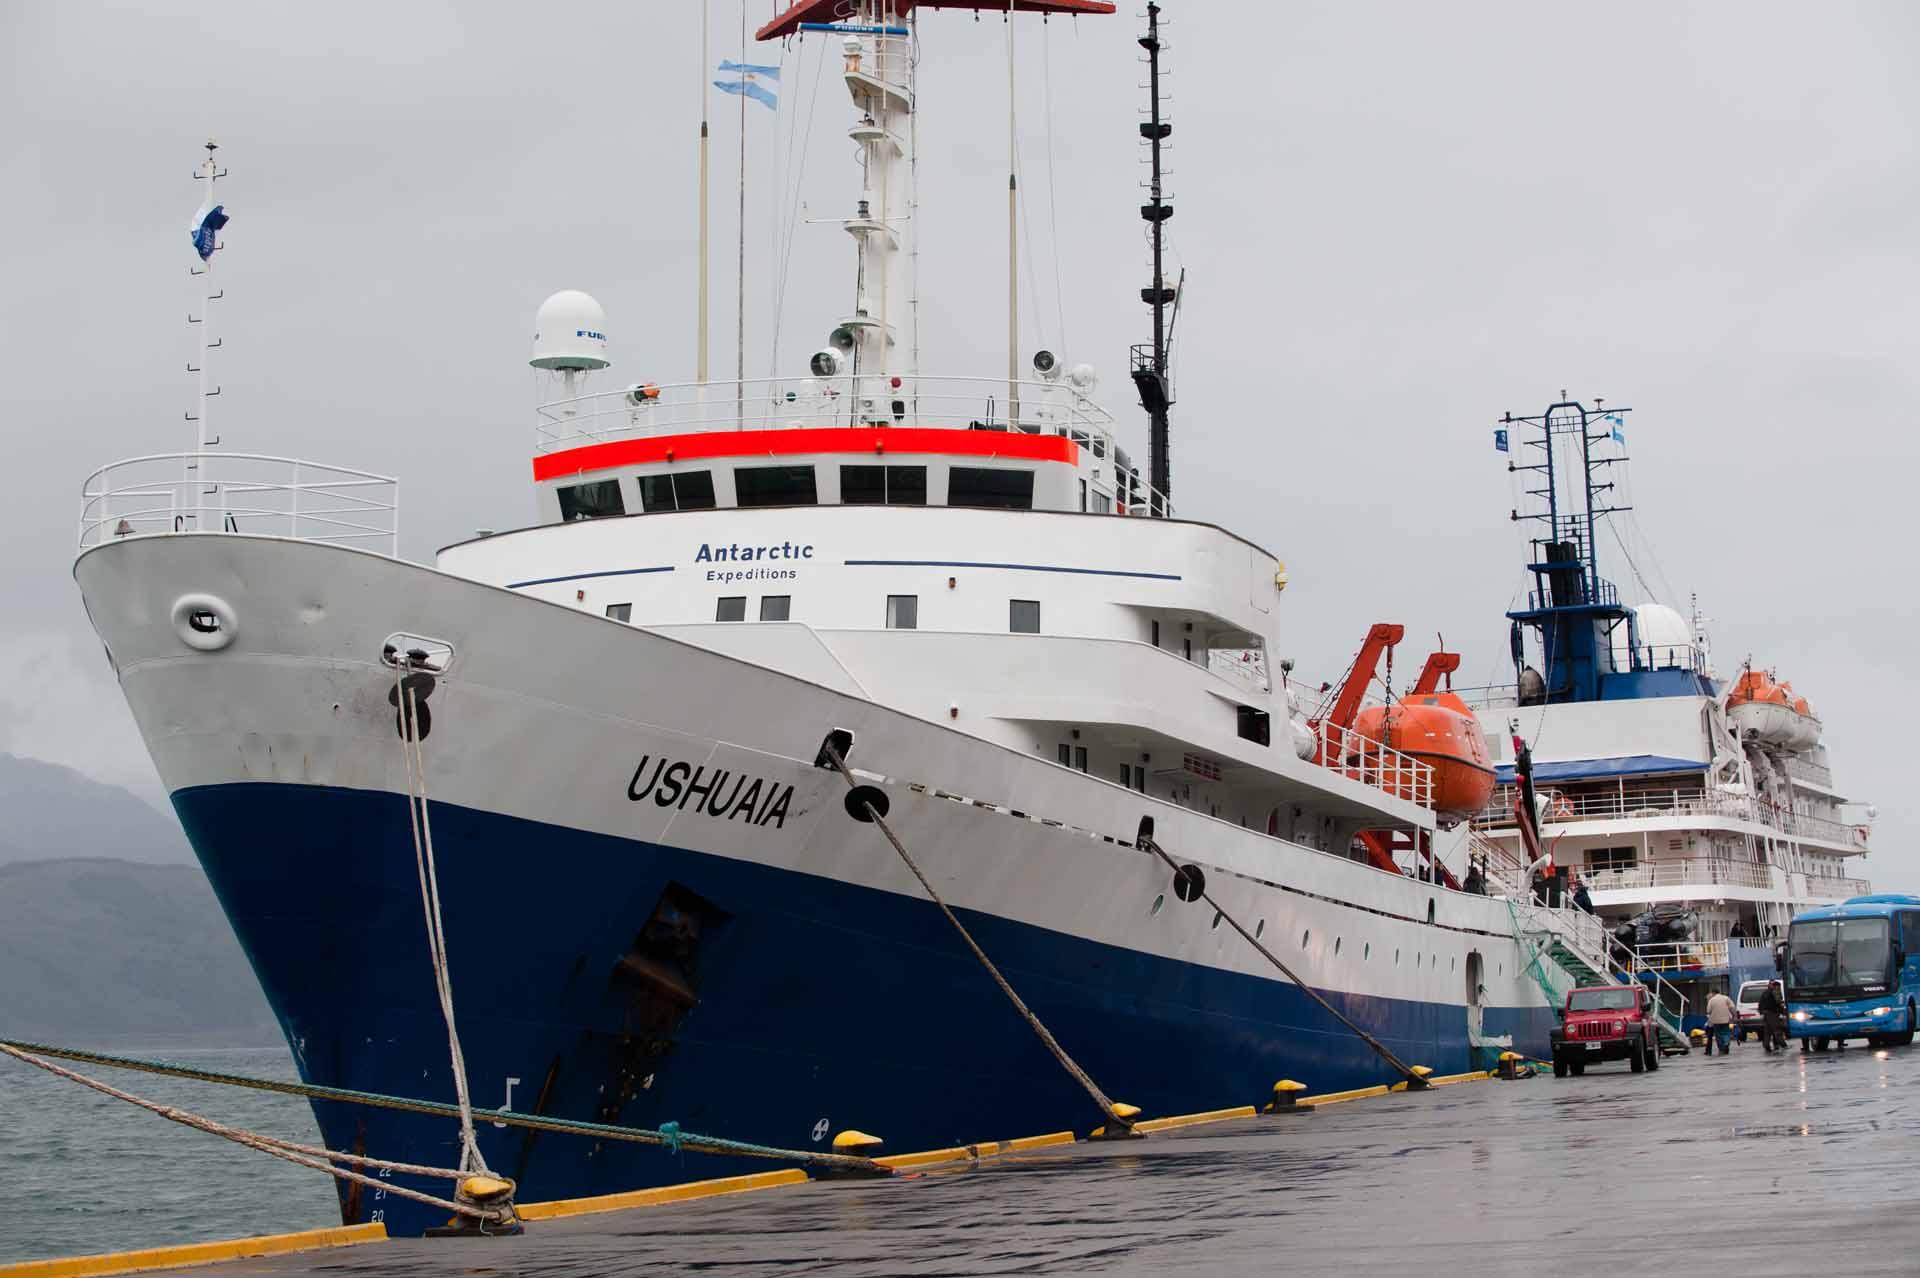 Ushuaia, the ship servicing Classic South Georgia & Antarctica